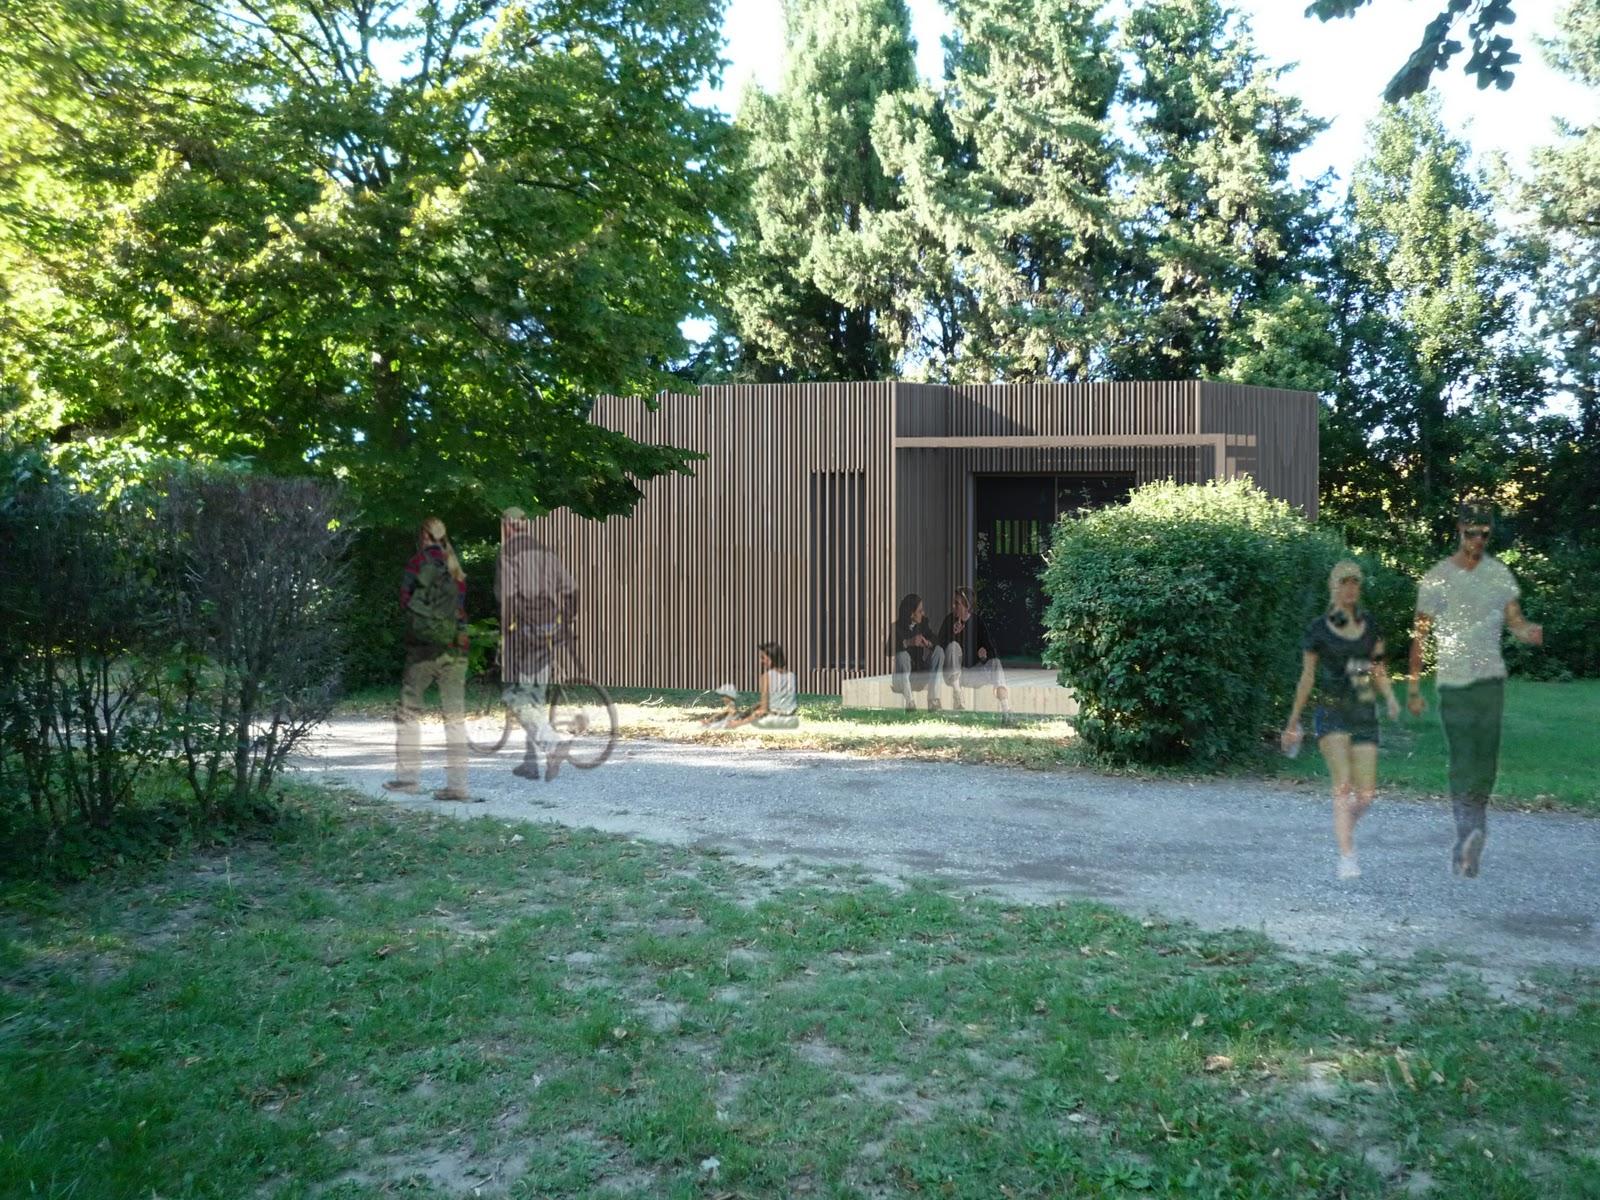 canaud architecte projet d 39 habitations l g res de loisirs hll gard. Black Bedroom Furniture Sets. Home Design Ideas